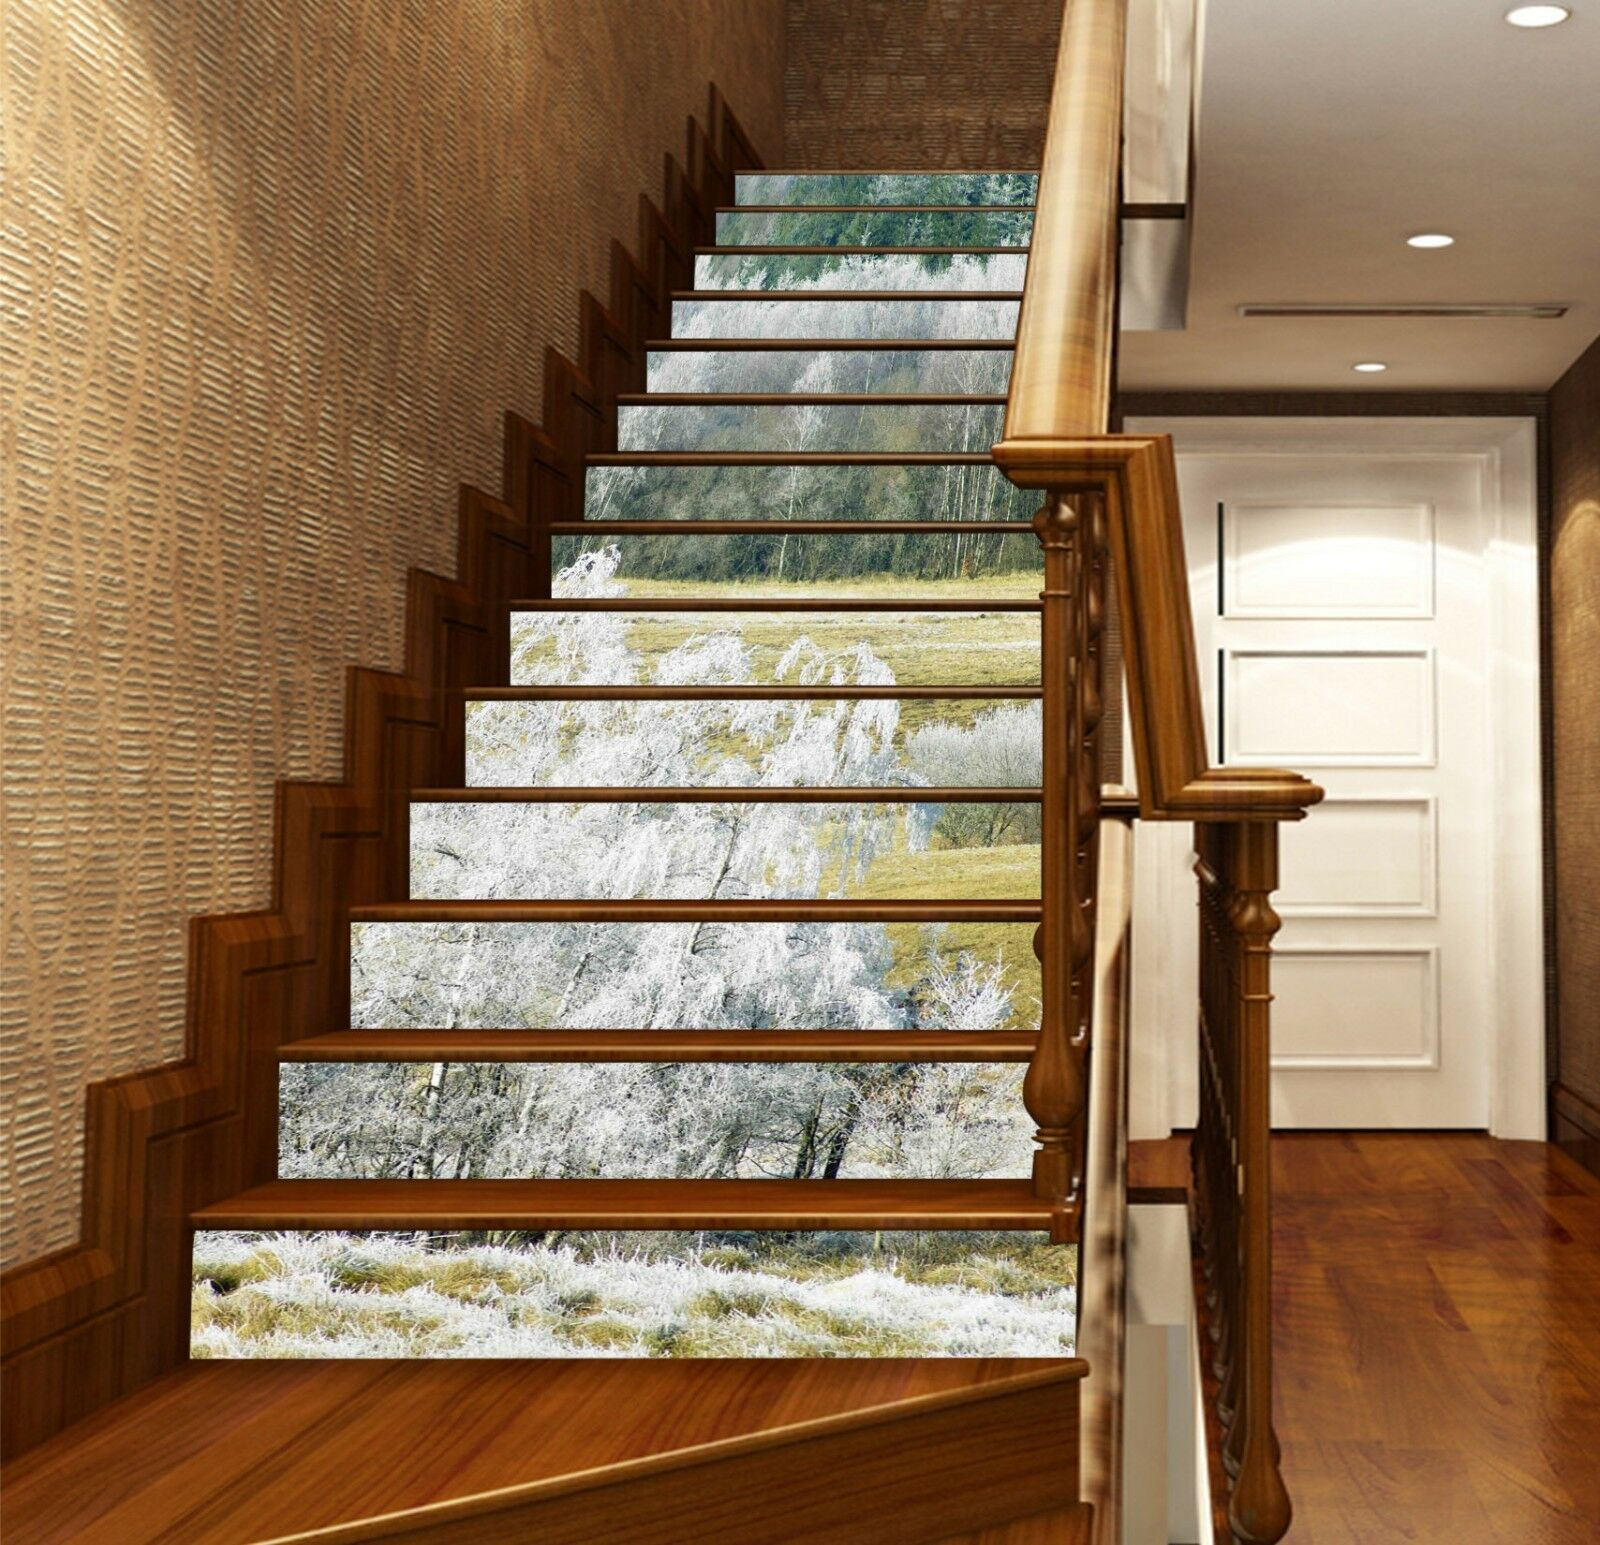 3D Tree lawn 245 Stair Risers Decoration Photo Mural Vinyl Decal Wallpaper UK